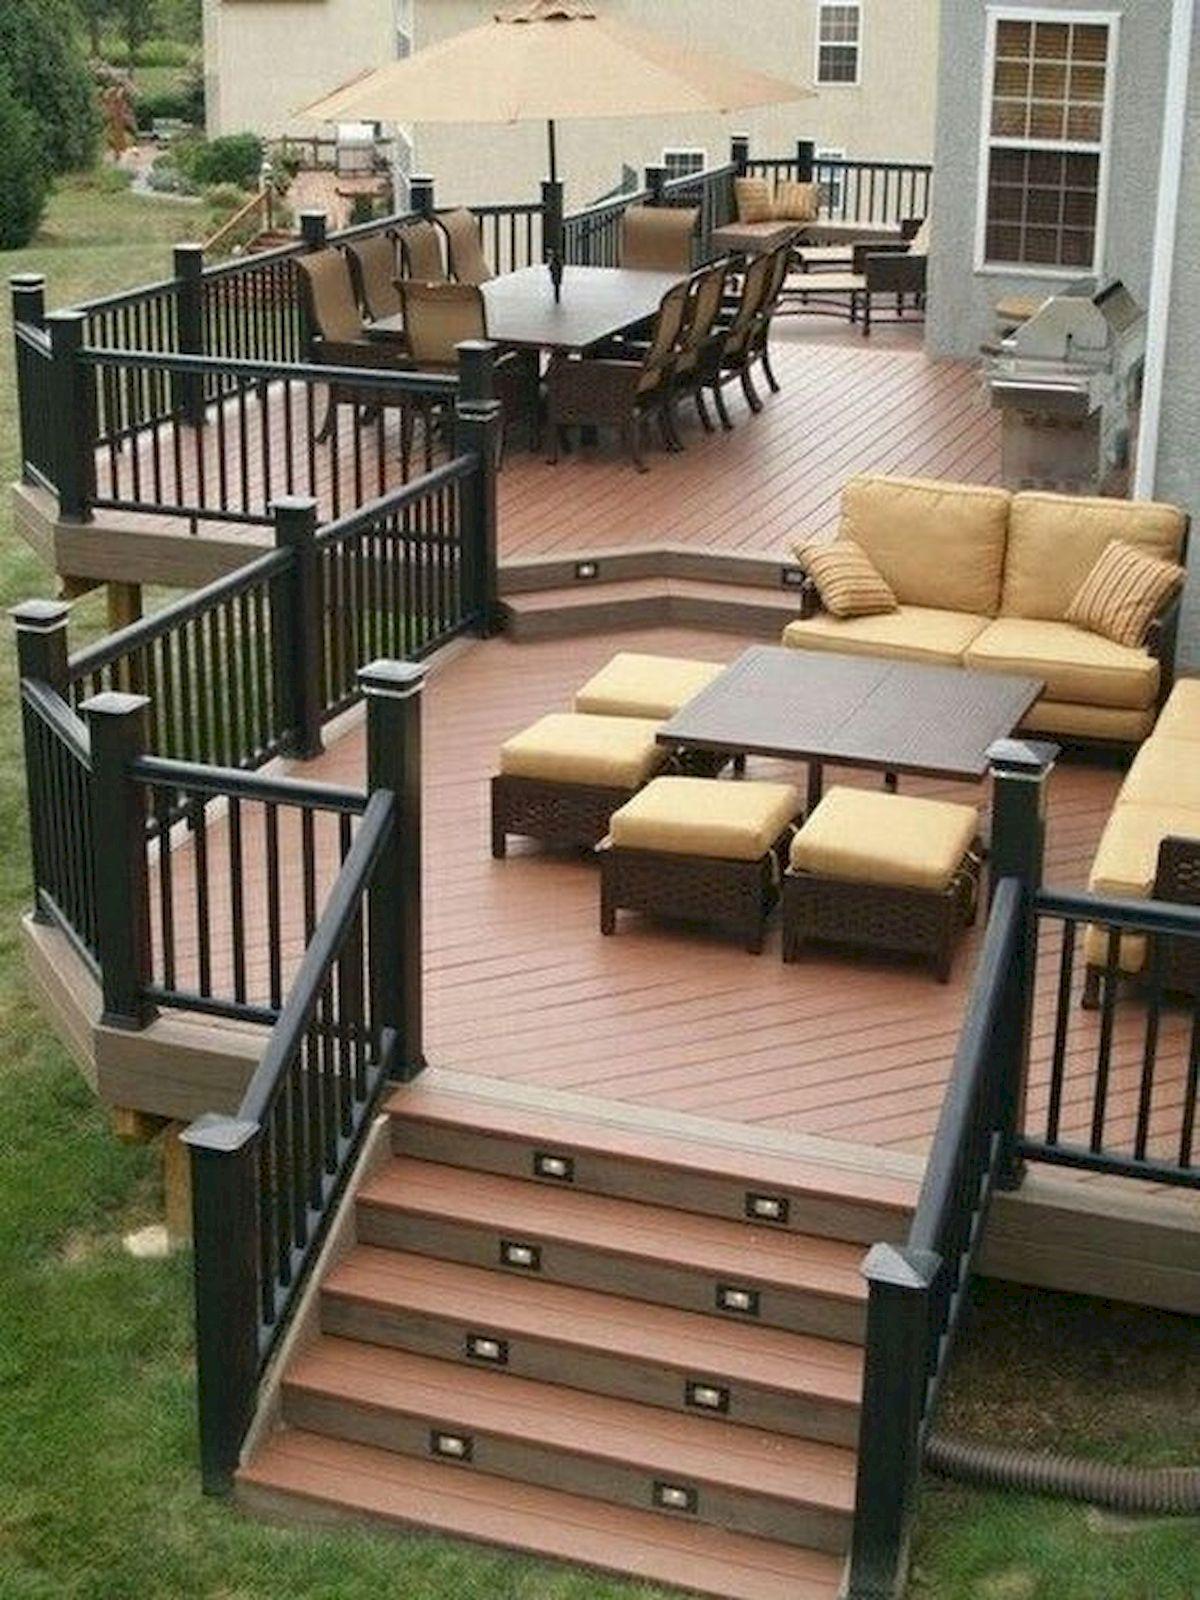 50 Best DIY Backyard Patio and Decking Design Ideas (10)